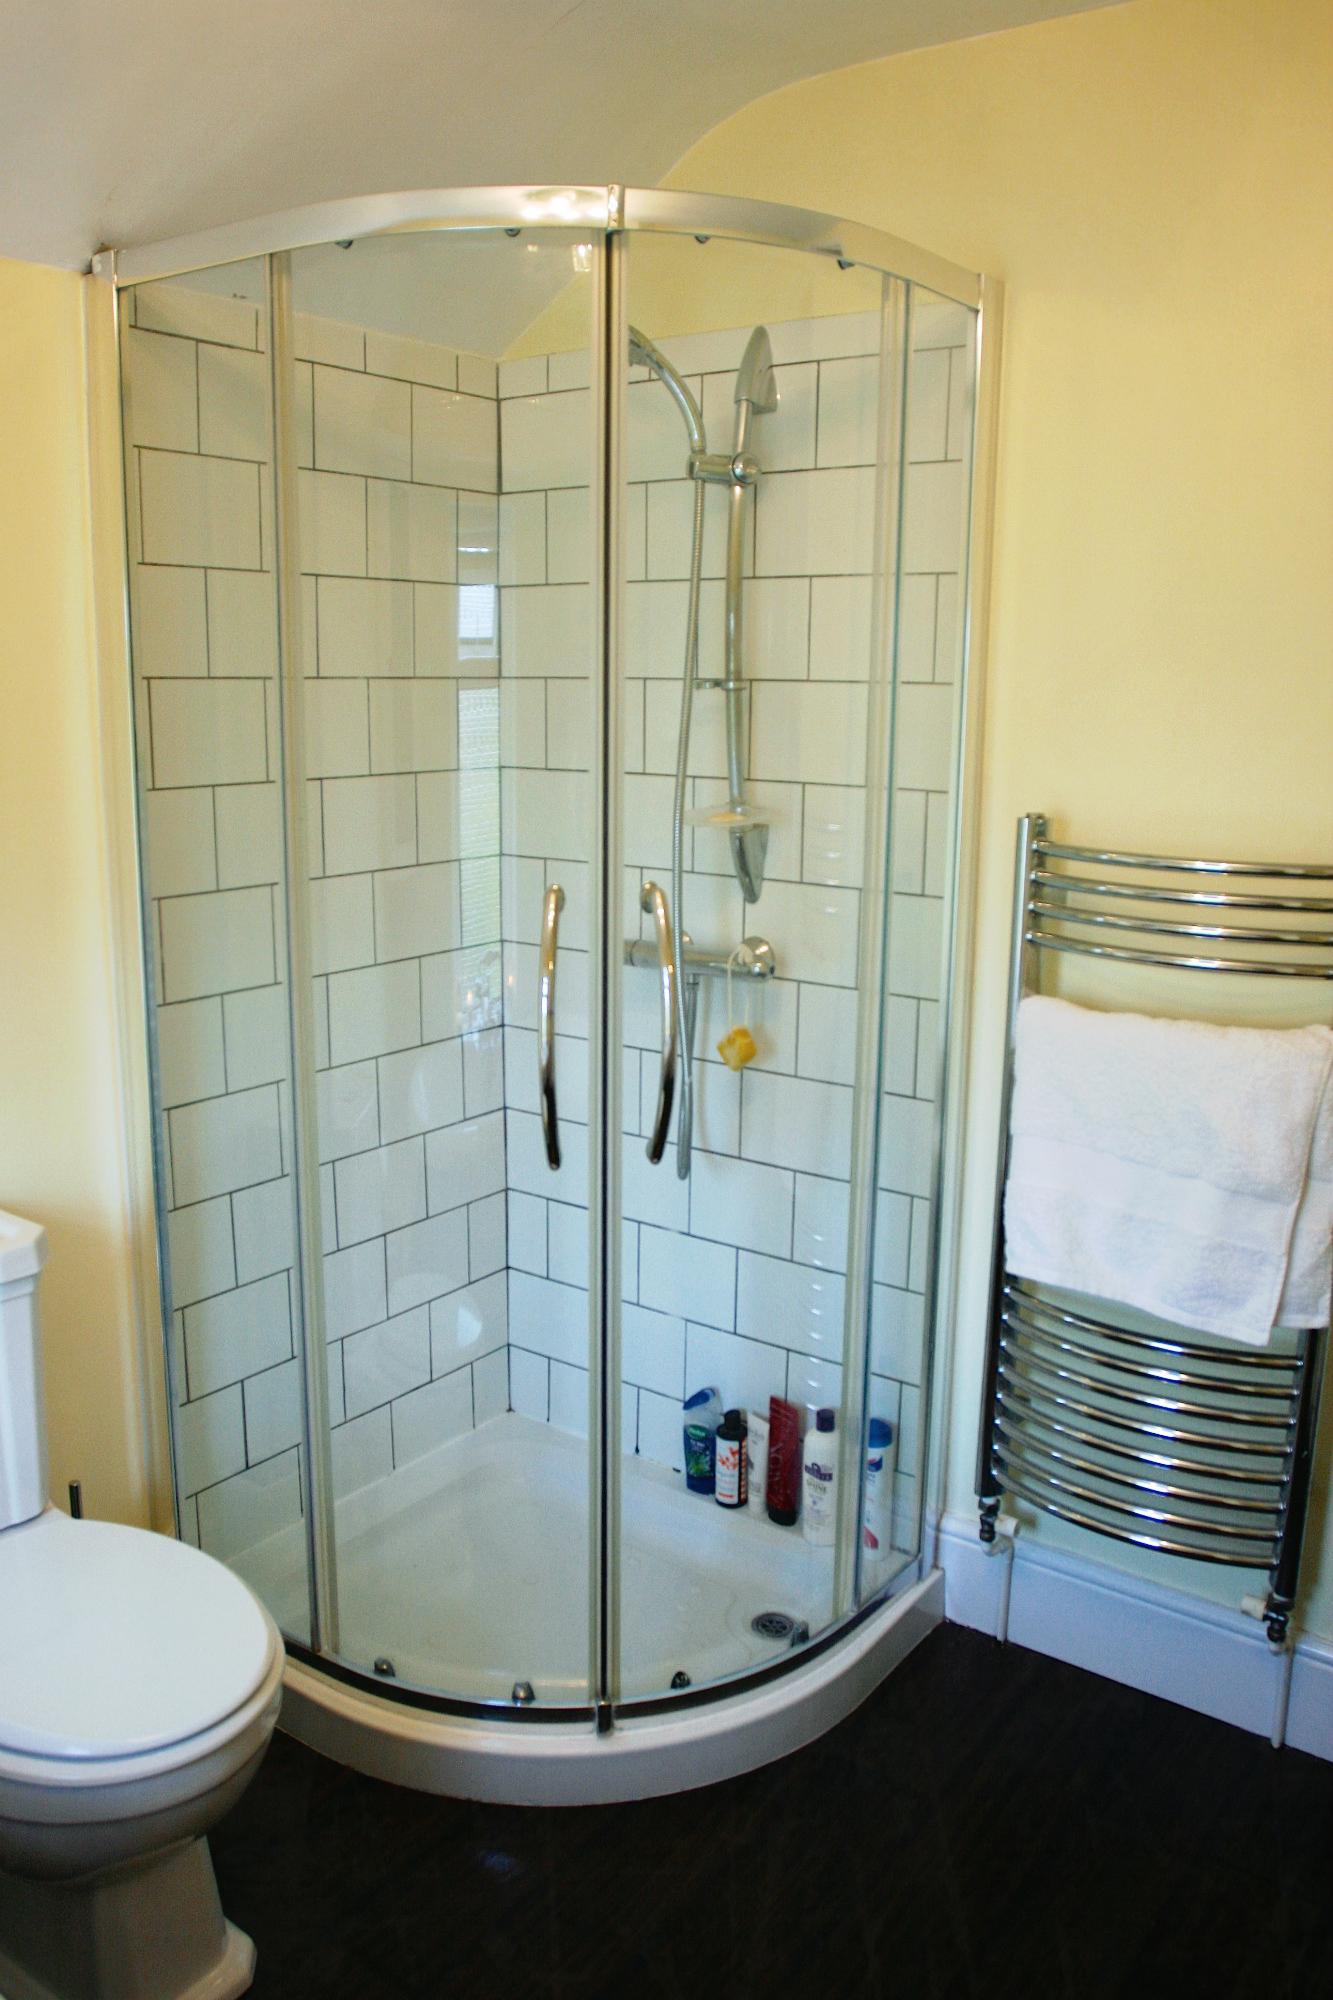 Bhs Bathroom Storage This Little House The Bathroom Daisychains Dreamers